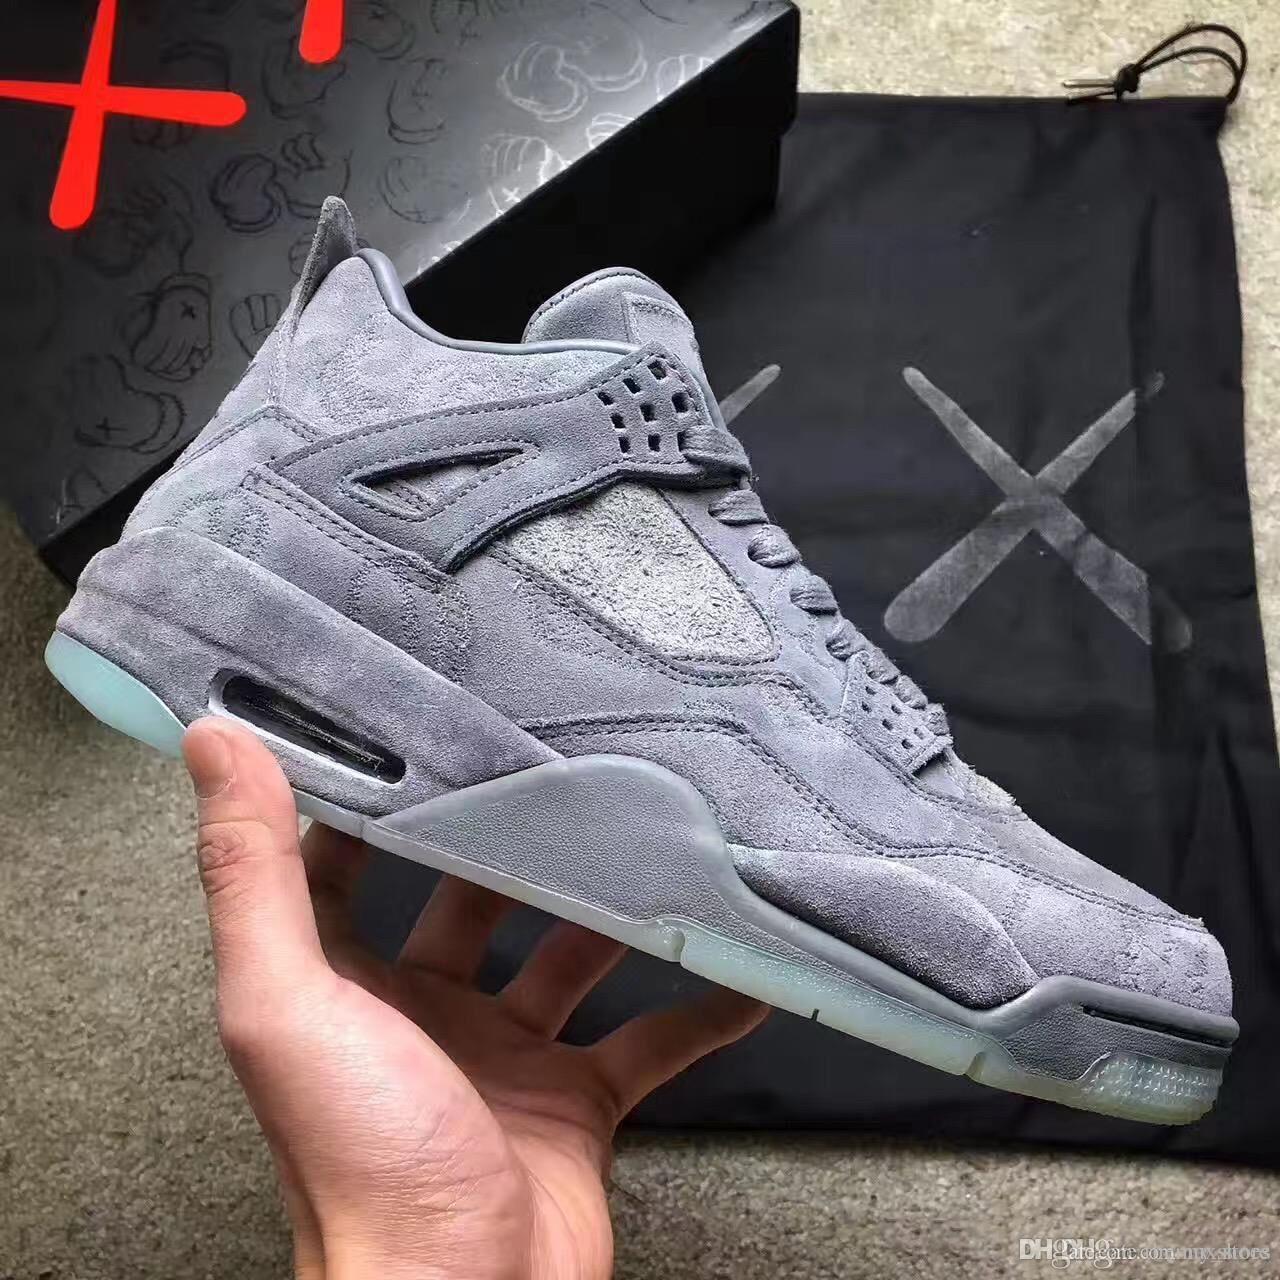 check out b9b94 a51d8 Hot KAWS x 4 4s XX Kaws Cool Grey White Glow Men Basketball Shoes 4s White  Blue black sports sneakers